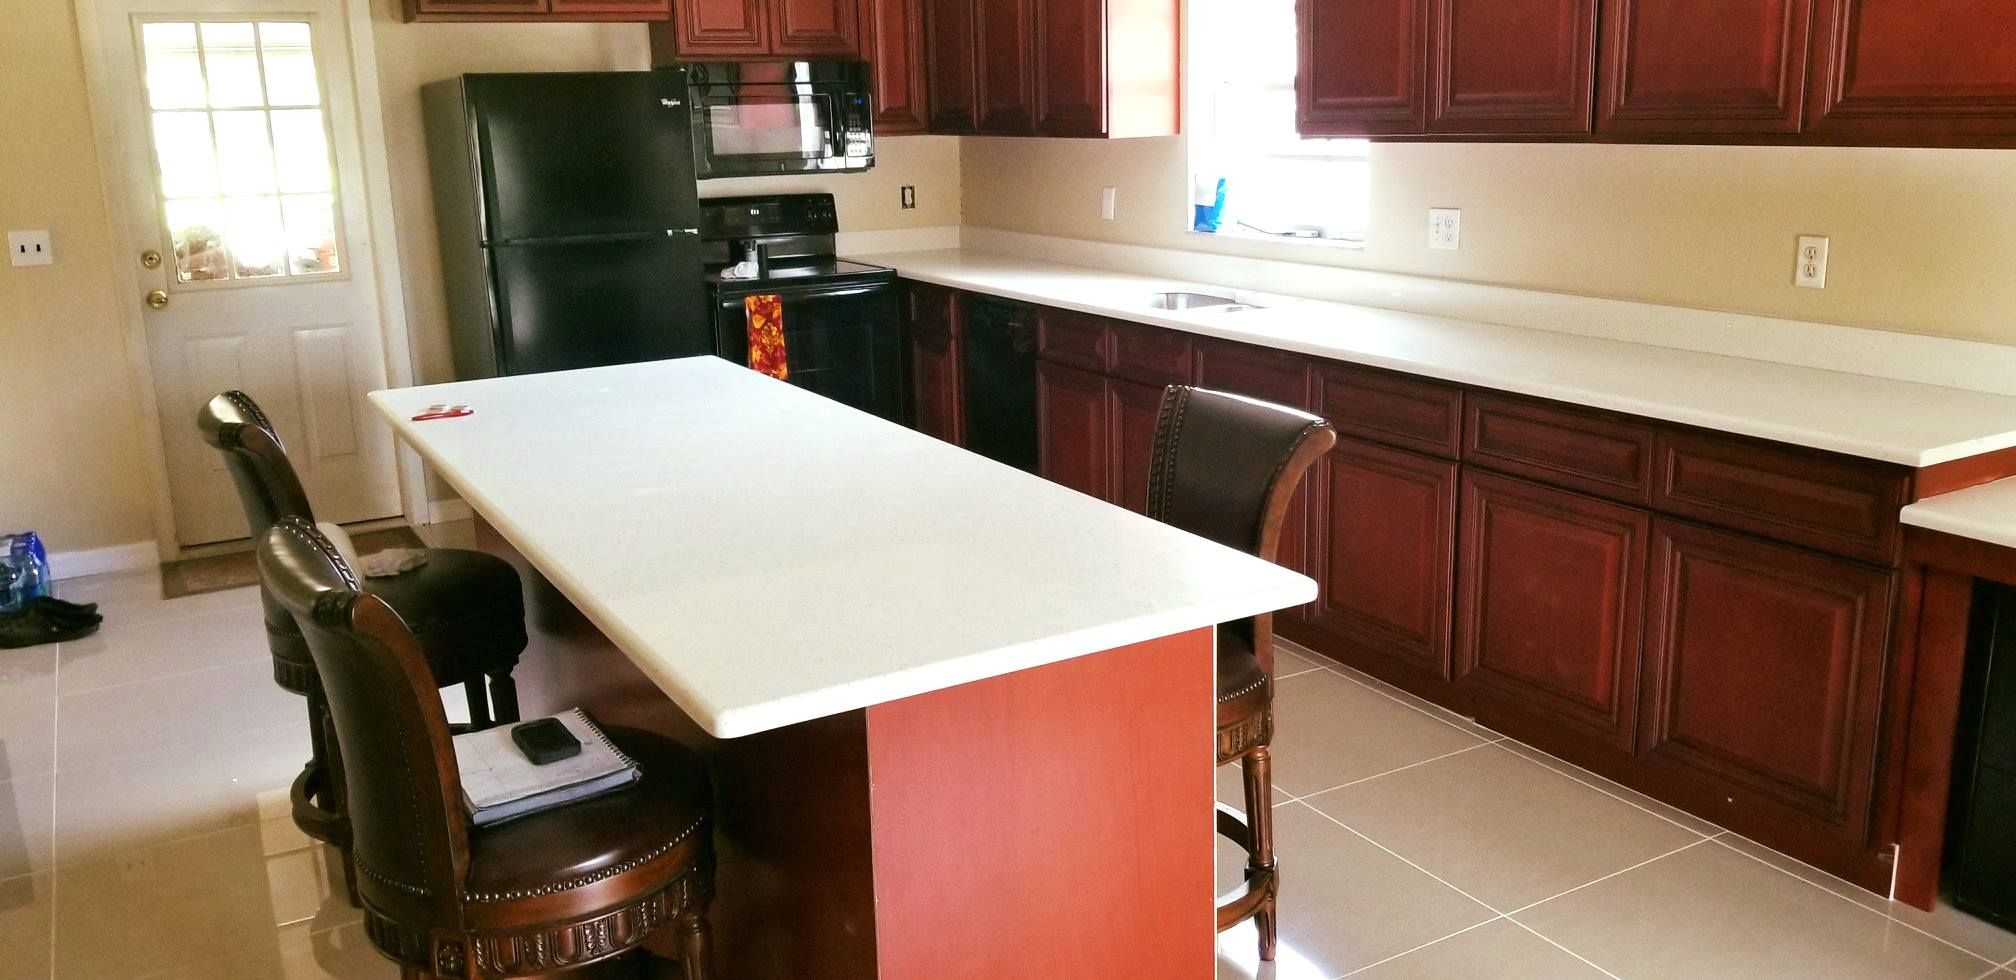 amazing custom made kitchen island countertop made by using crystal white phoenix quartz on kitchen island ideas white quartz id=32120